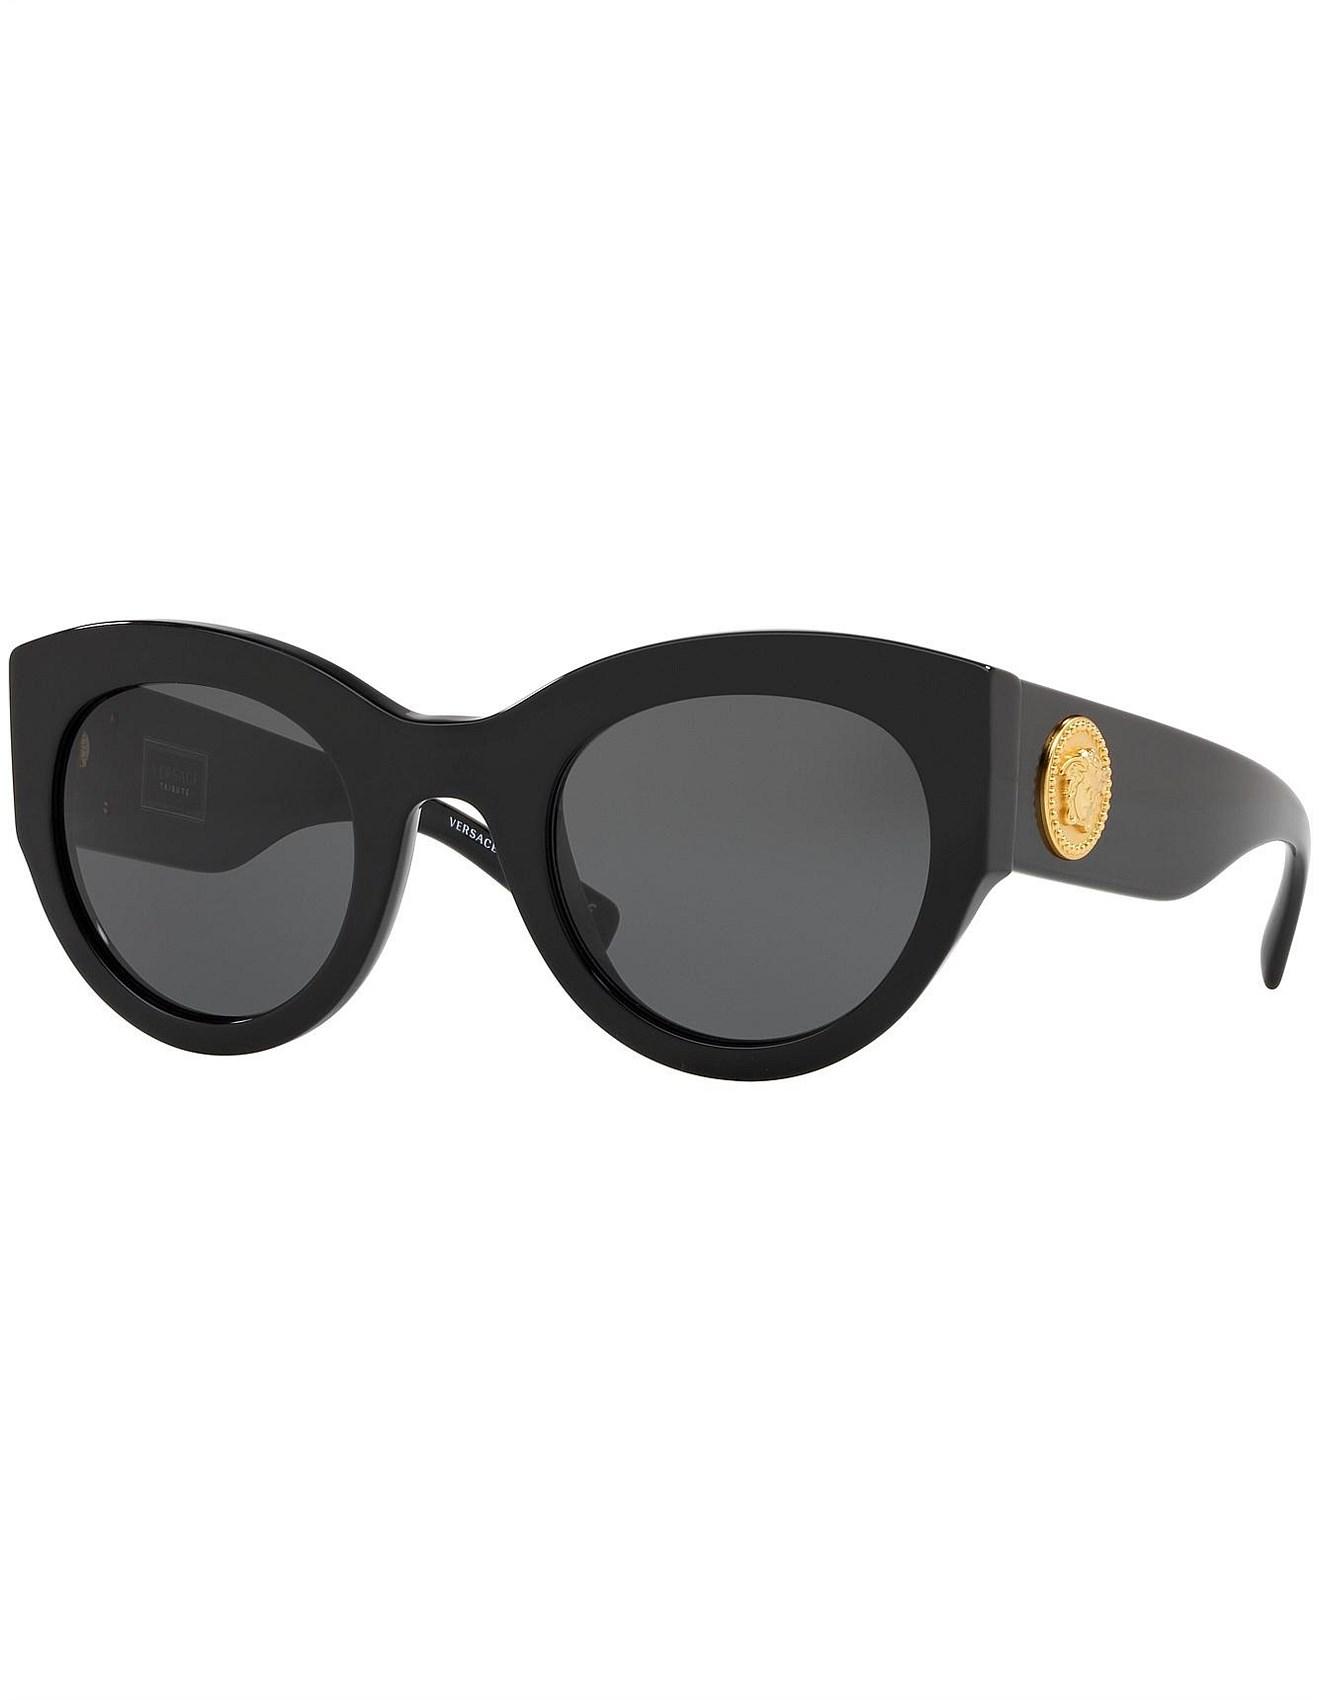 271bf97efa6 Women s Cateye Sunglasses